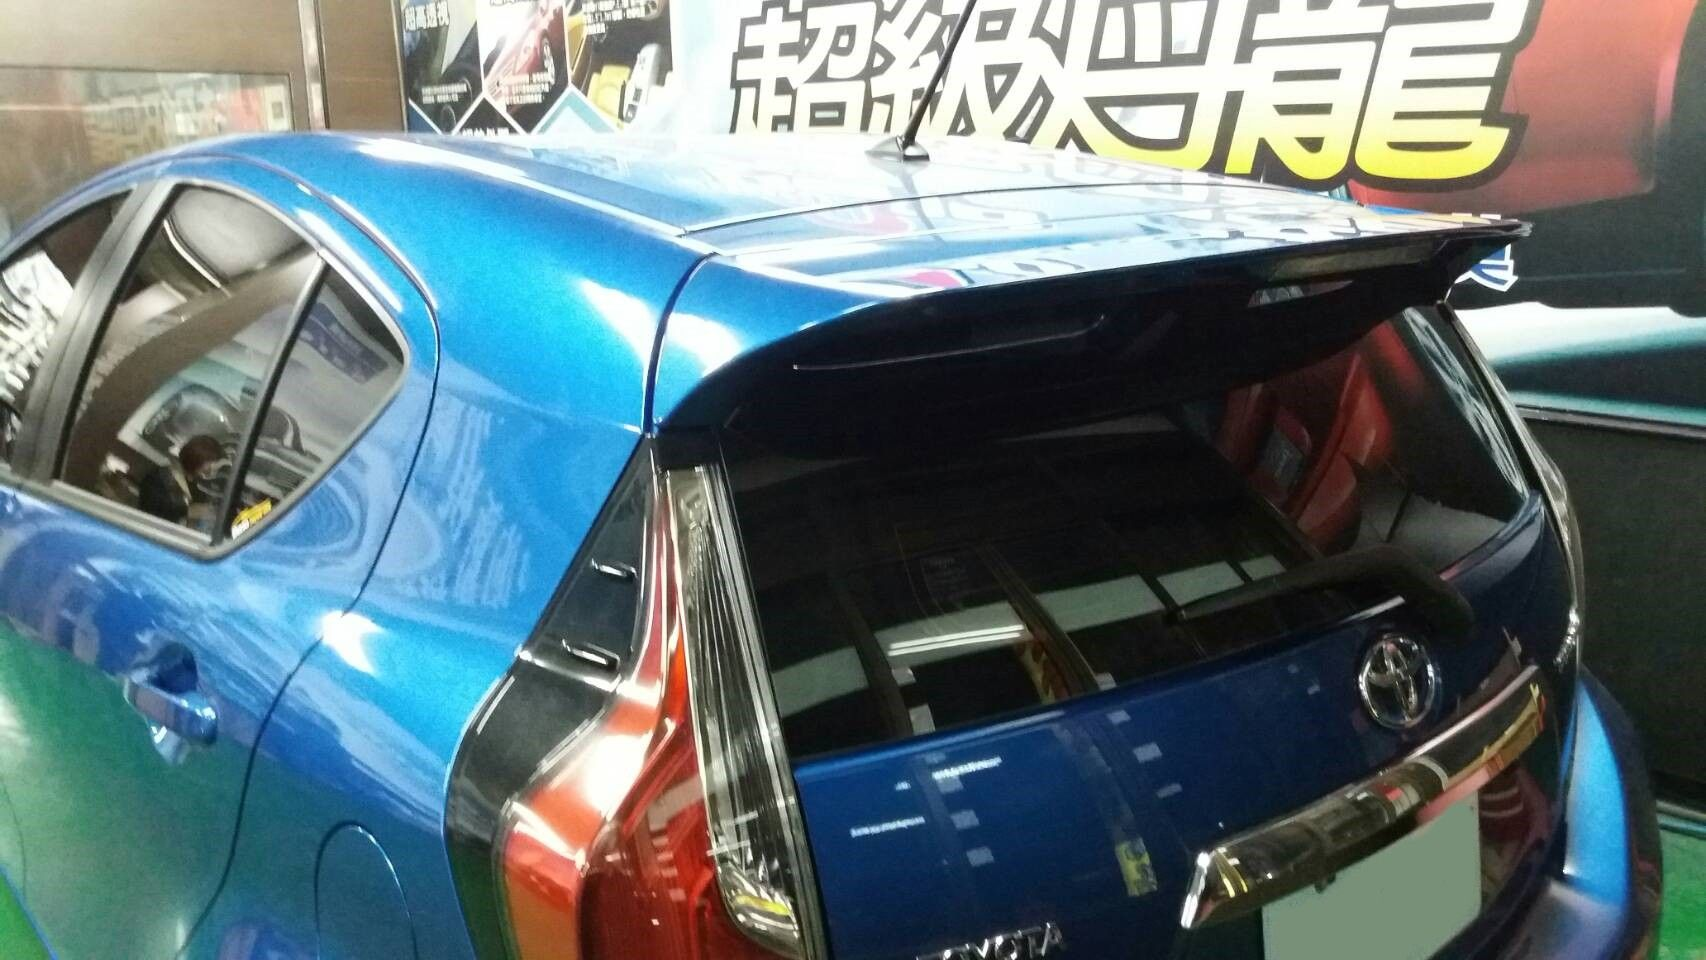 朴子全信SUPERLEX菁英隔熱紙GE55+GE11 20170213